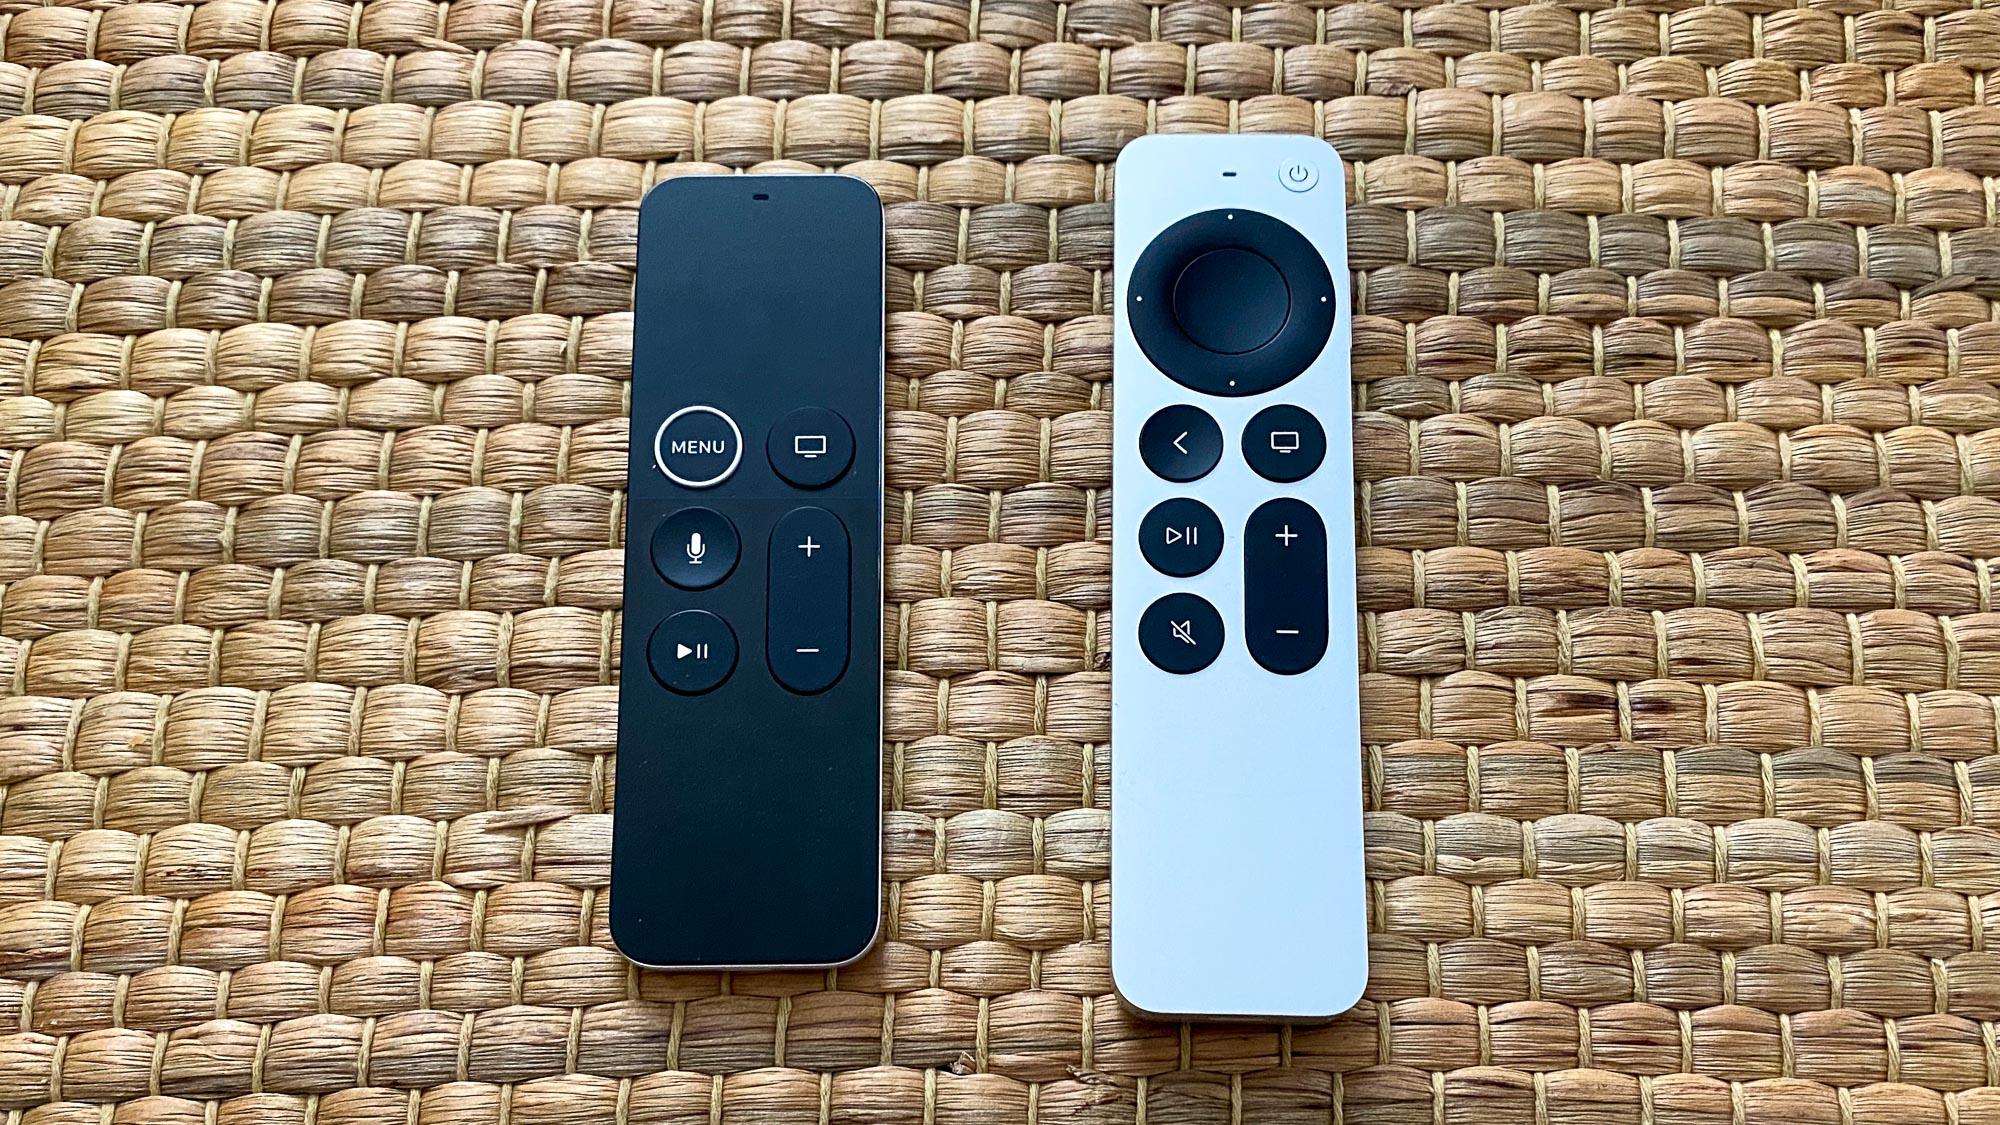 Apple TV 4K (2021) new remote